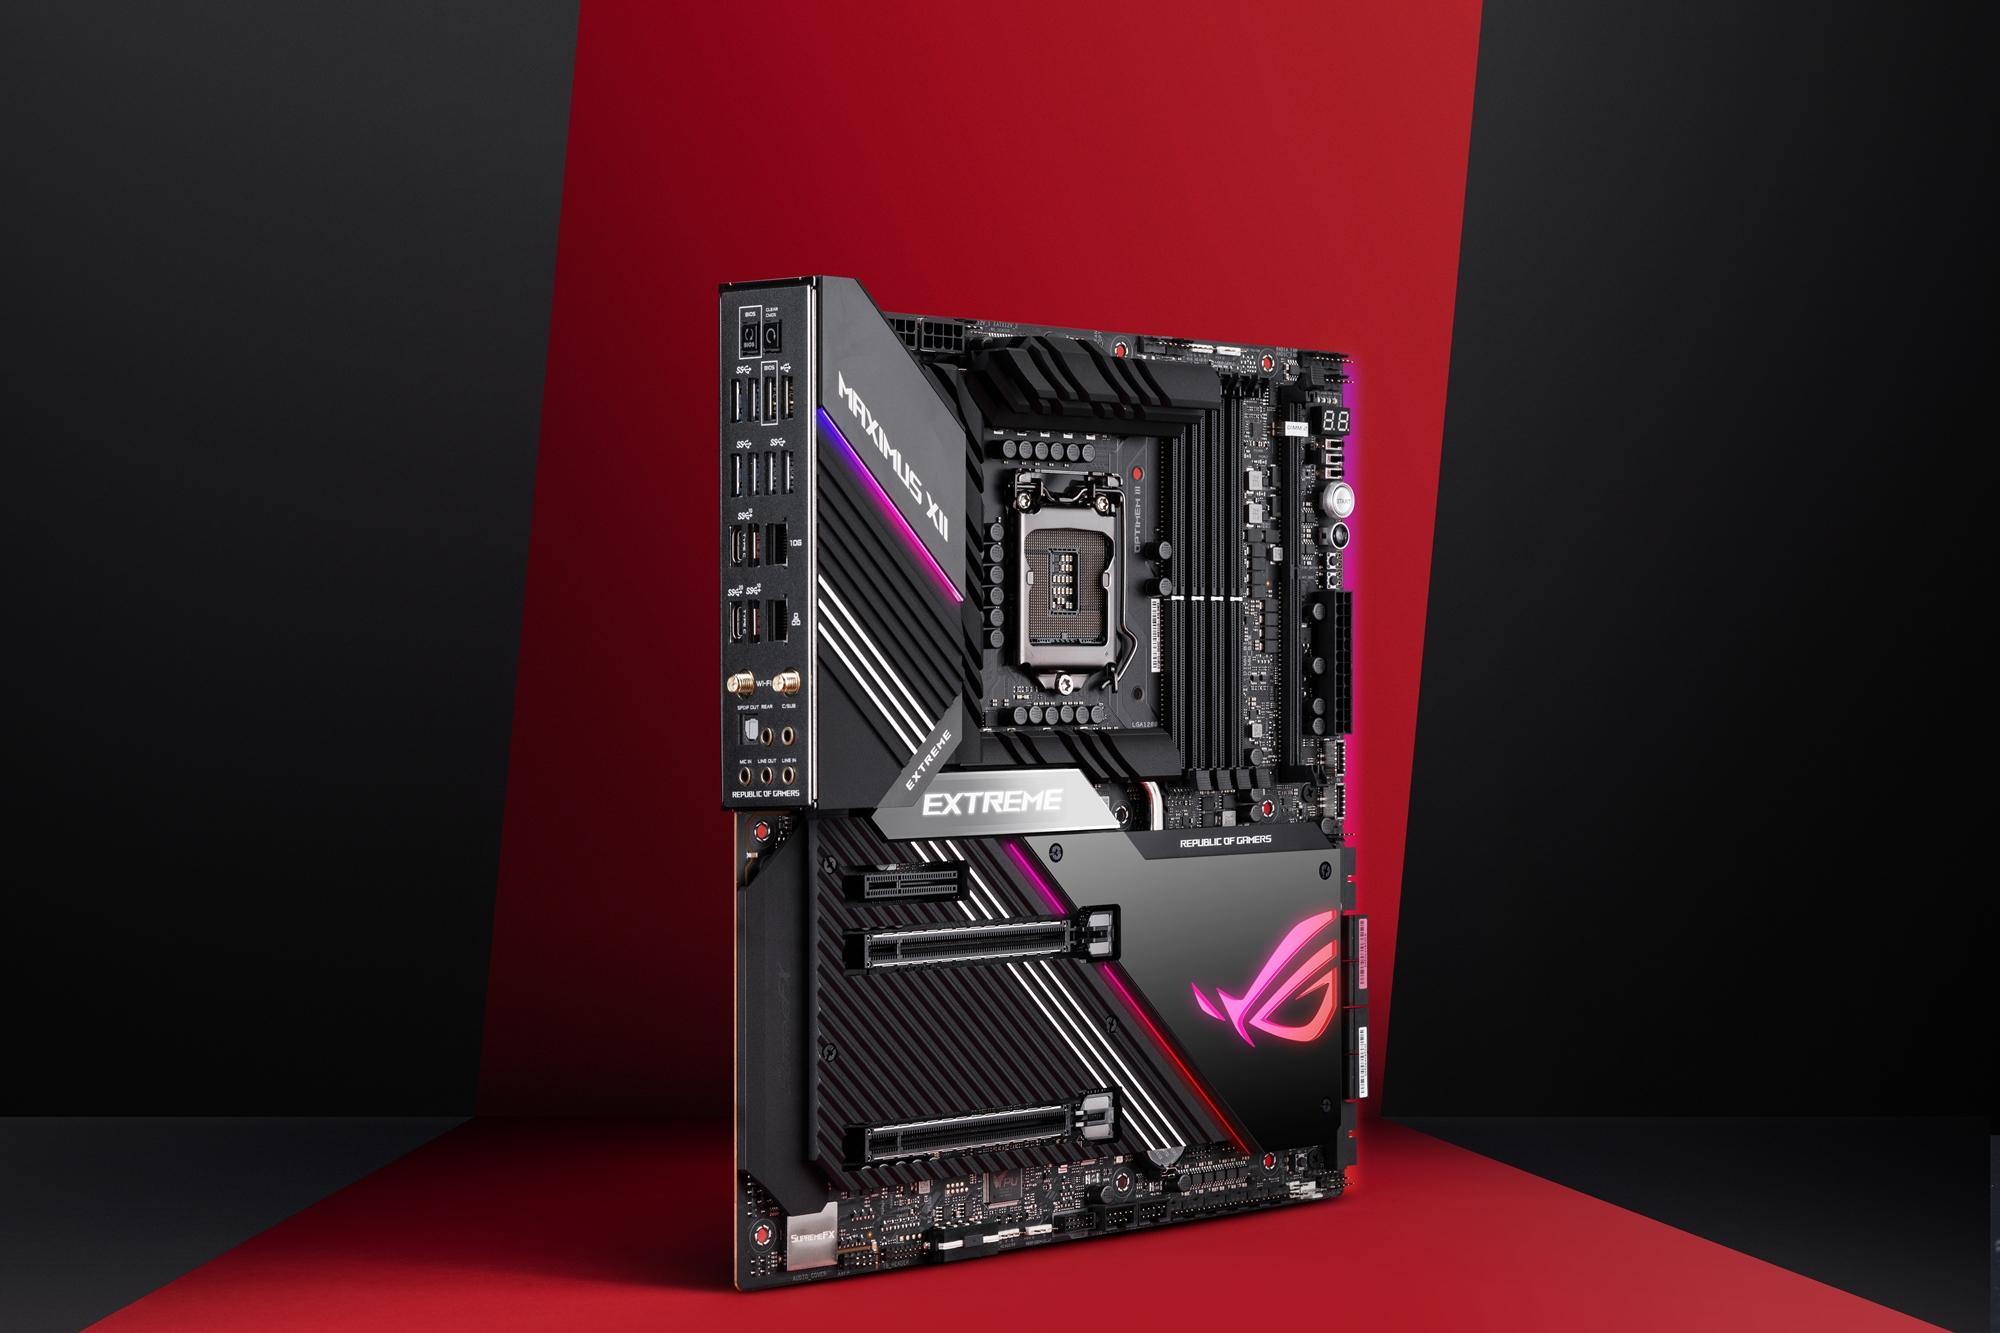 ROG Maximus XII Extreme主機板結合硬體和軟體,以實現最佳化的超頻、高速記憶體支援以及全面的水冷和風冷控制,可提供出色的效能以及高效、可靠的運作。